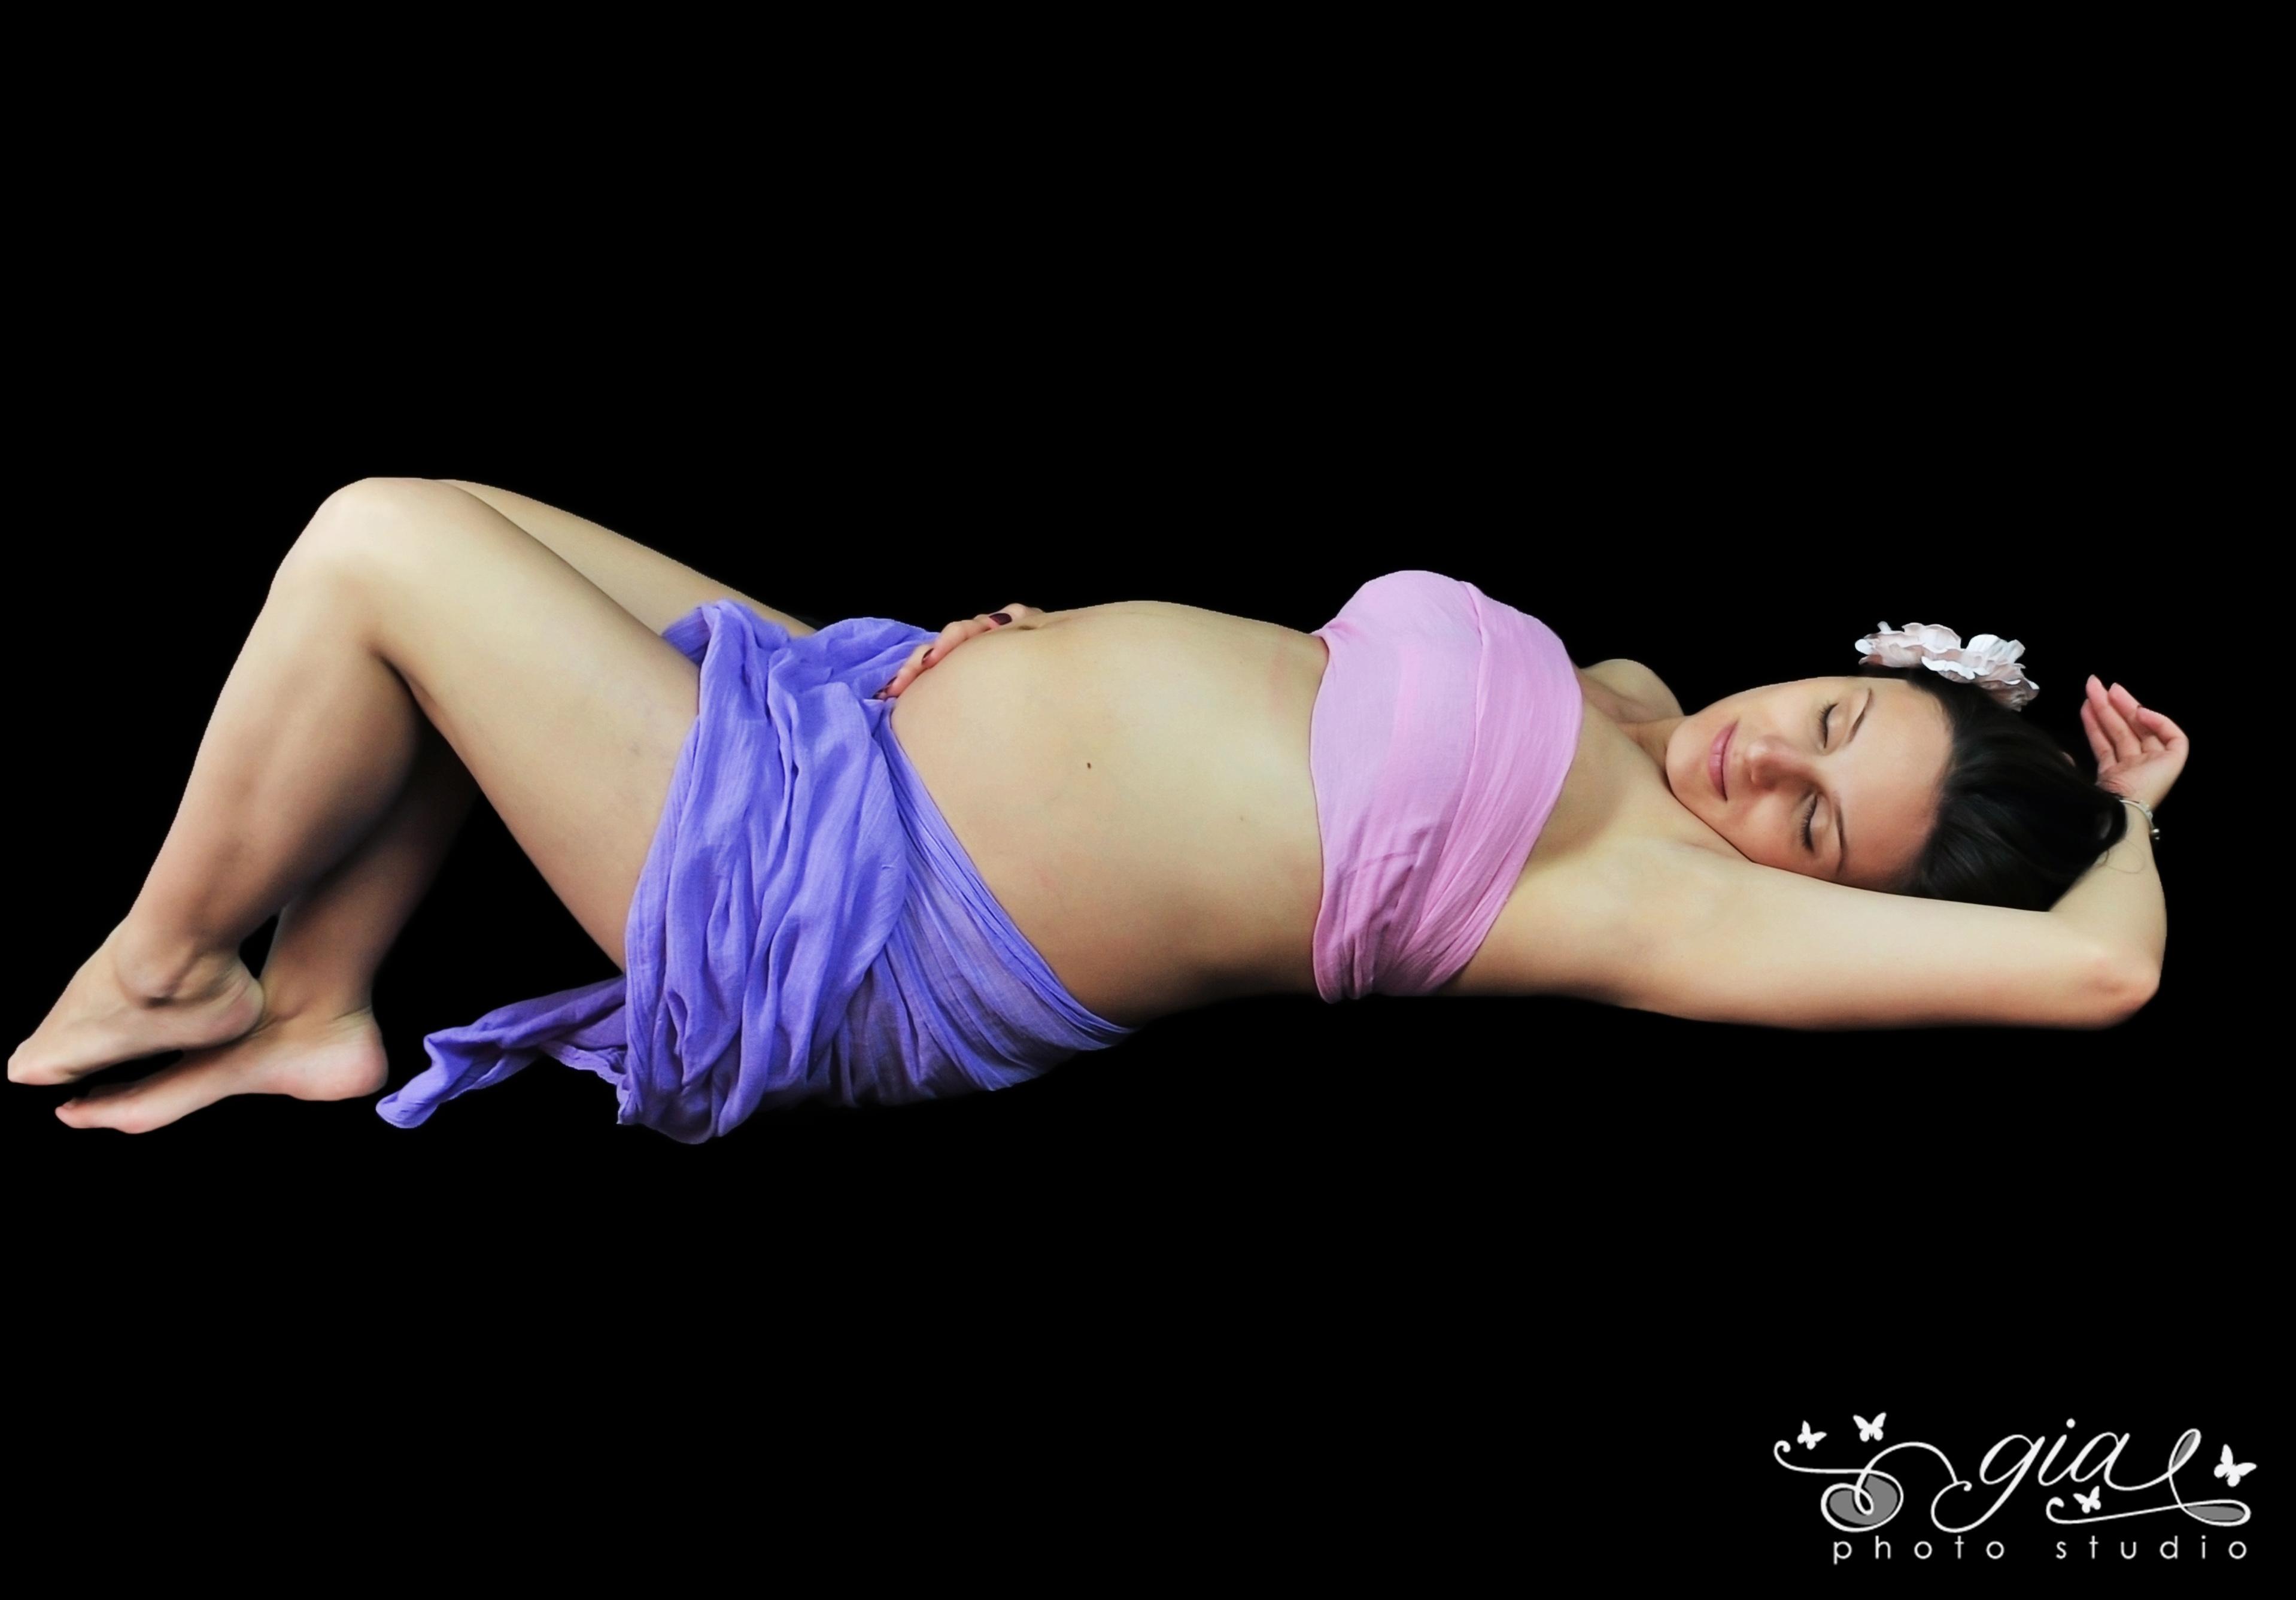 Poze gravide – viitoare mamici 1